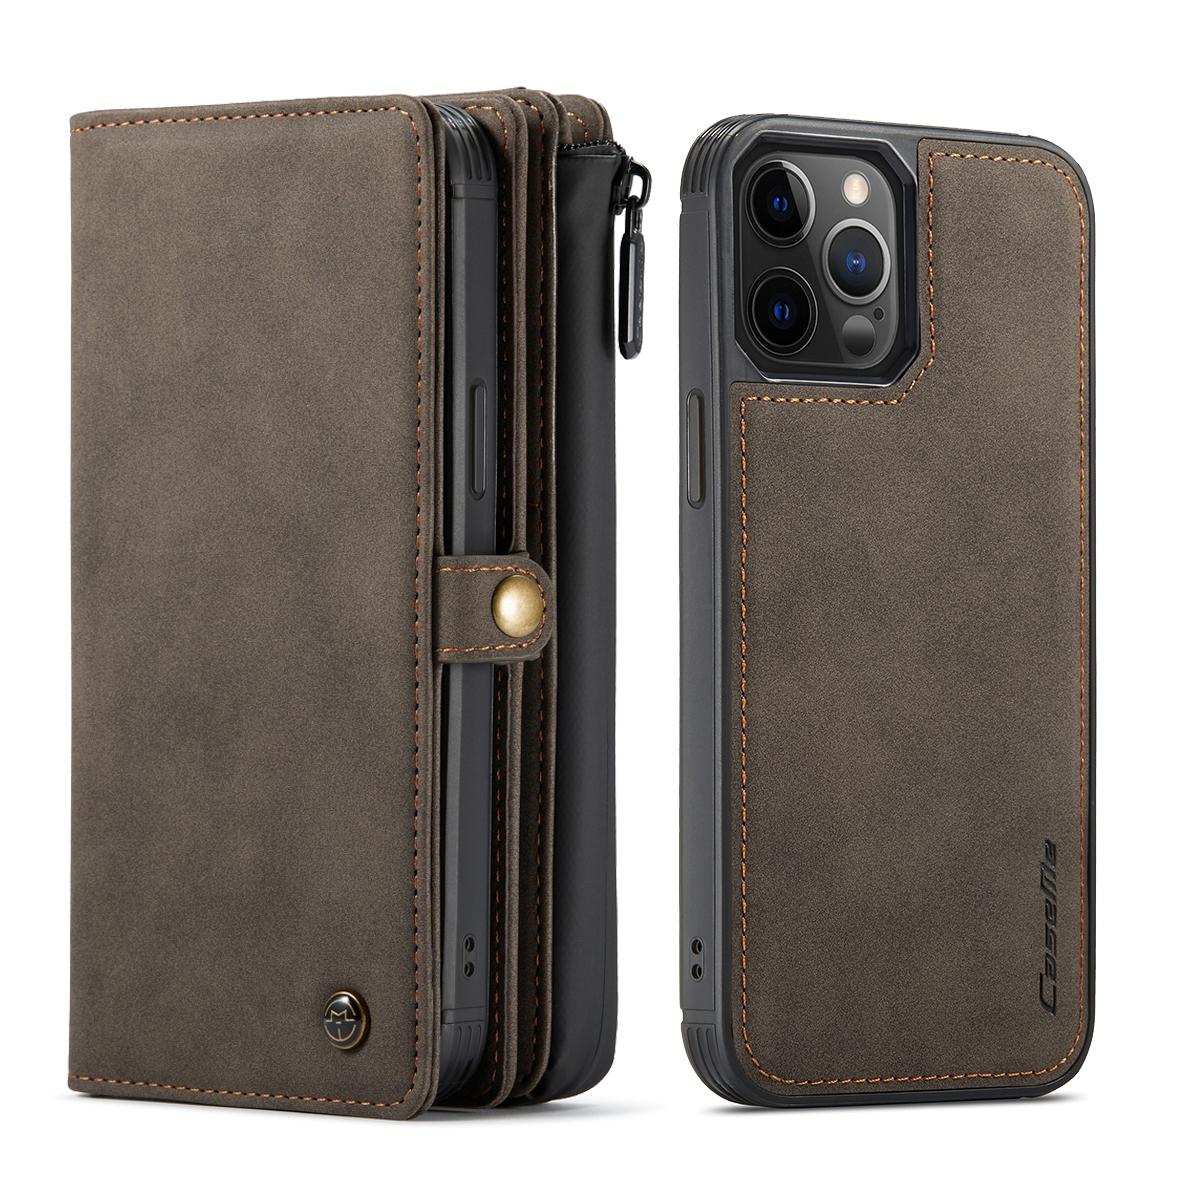 CaseMe 018 Series läderfodral till iPhone 12 Pro Max, brun